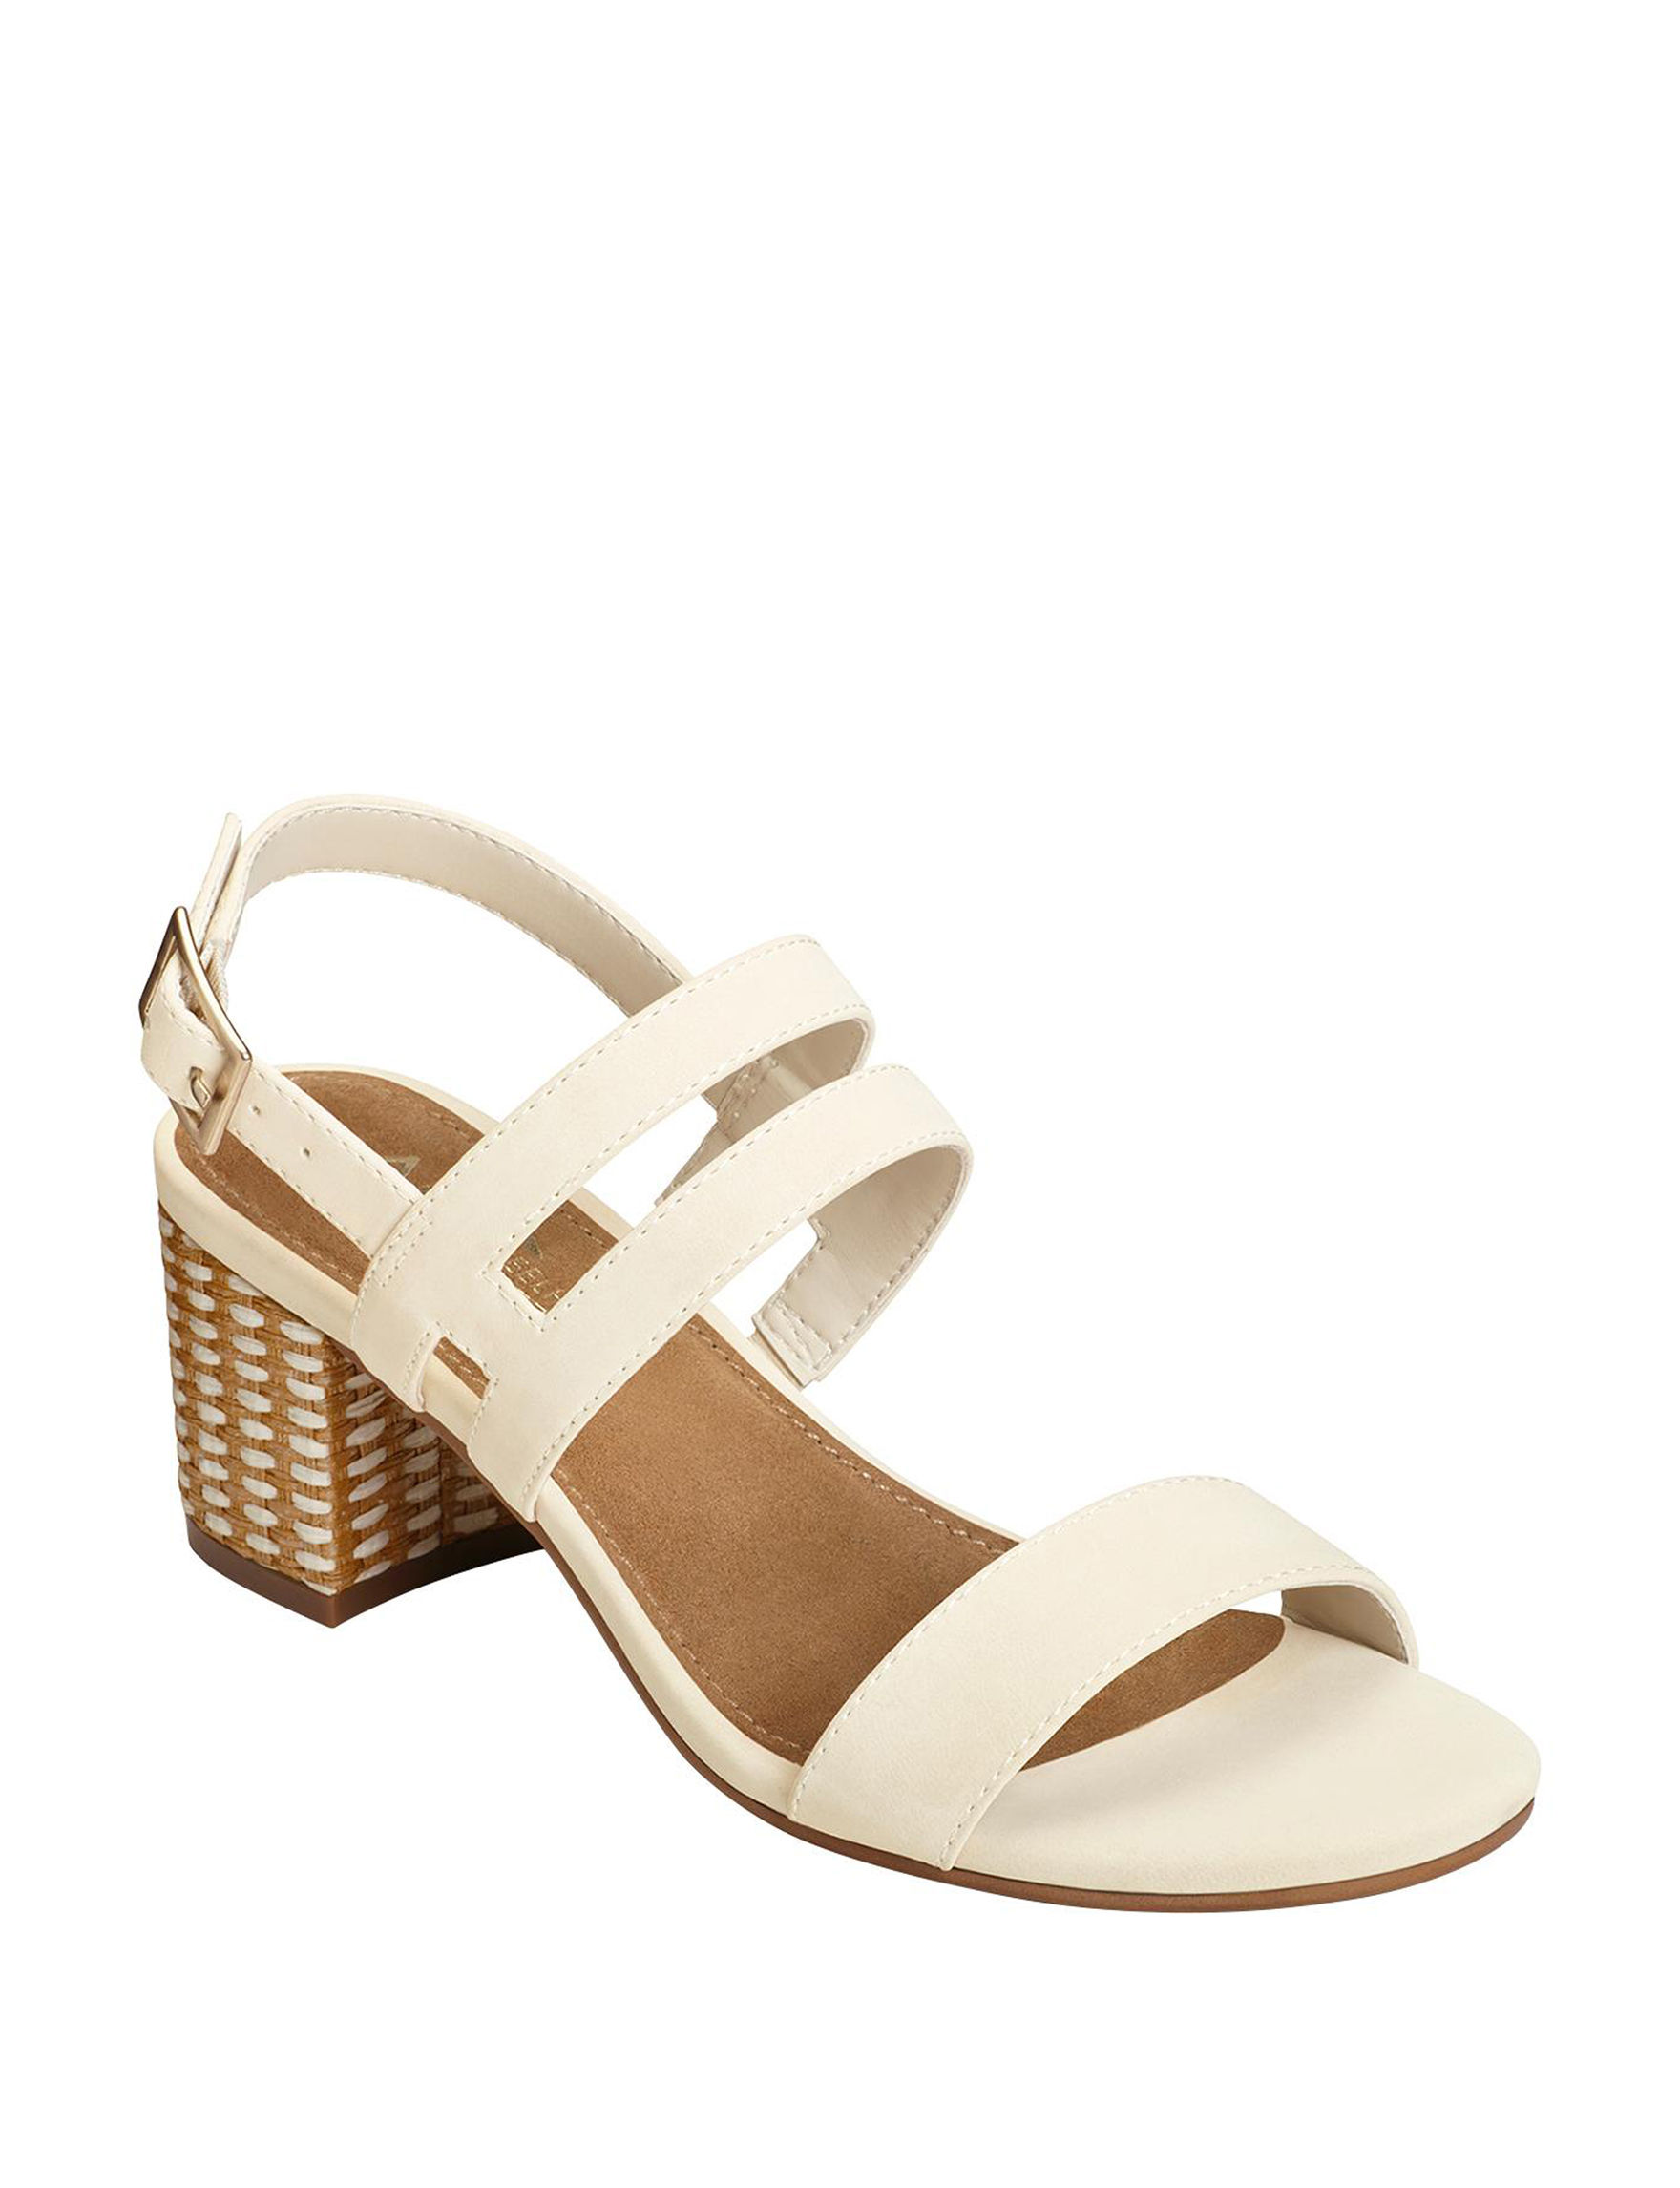 A2 by Aerosoles Bone Heeled Sandals